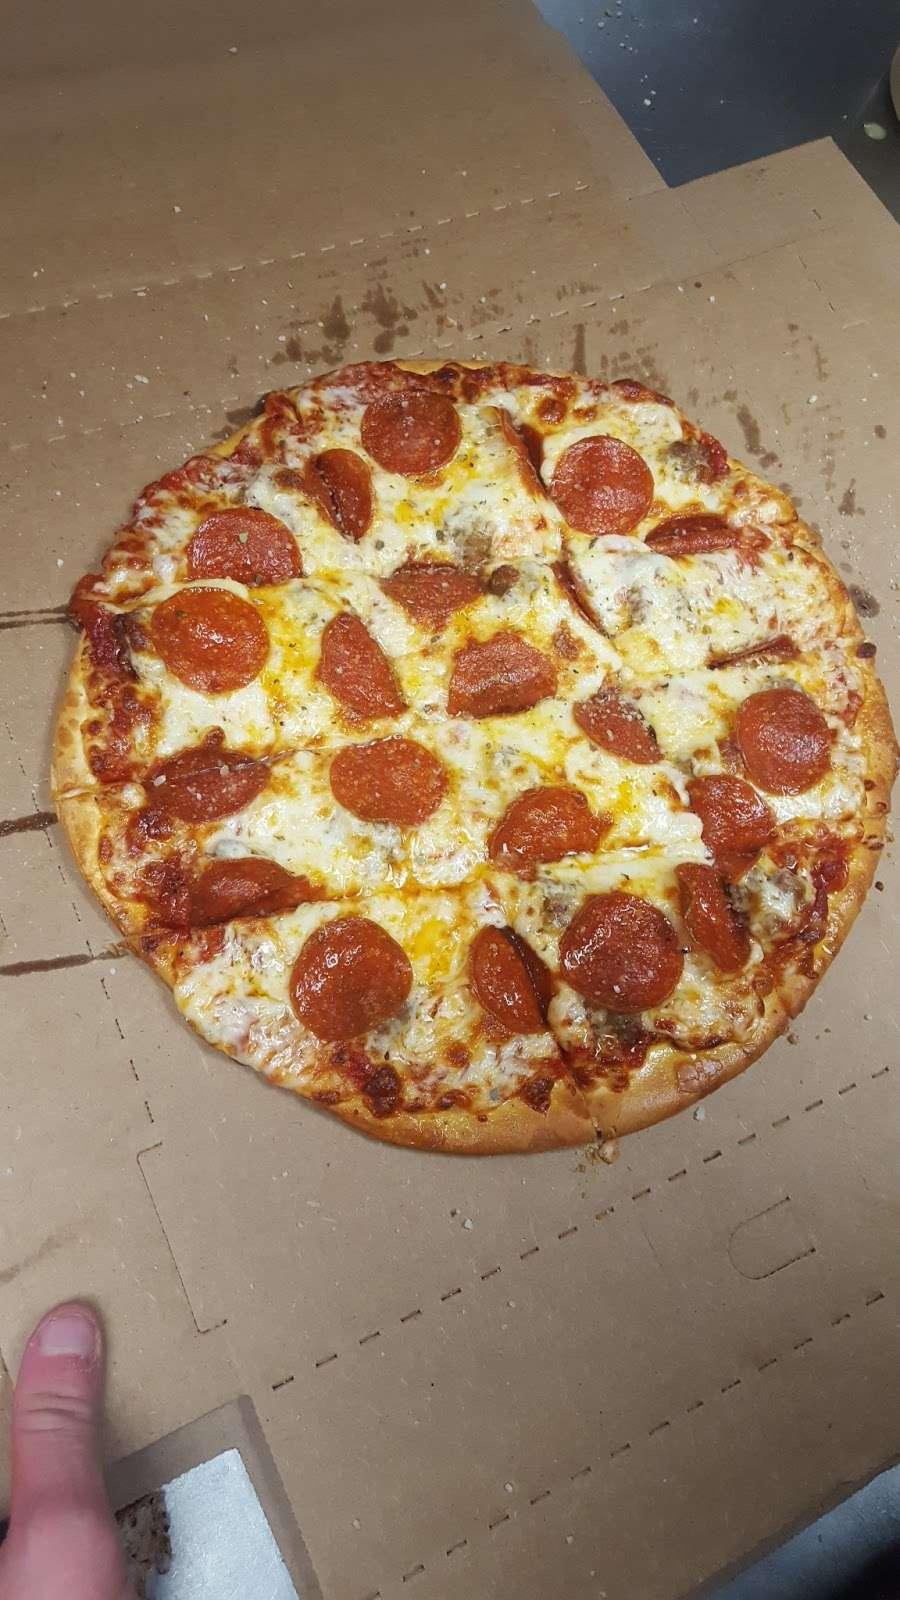 Pizza For U Restaurant 25356 W Eames St Channahon Il